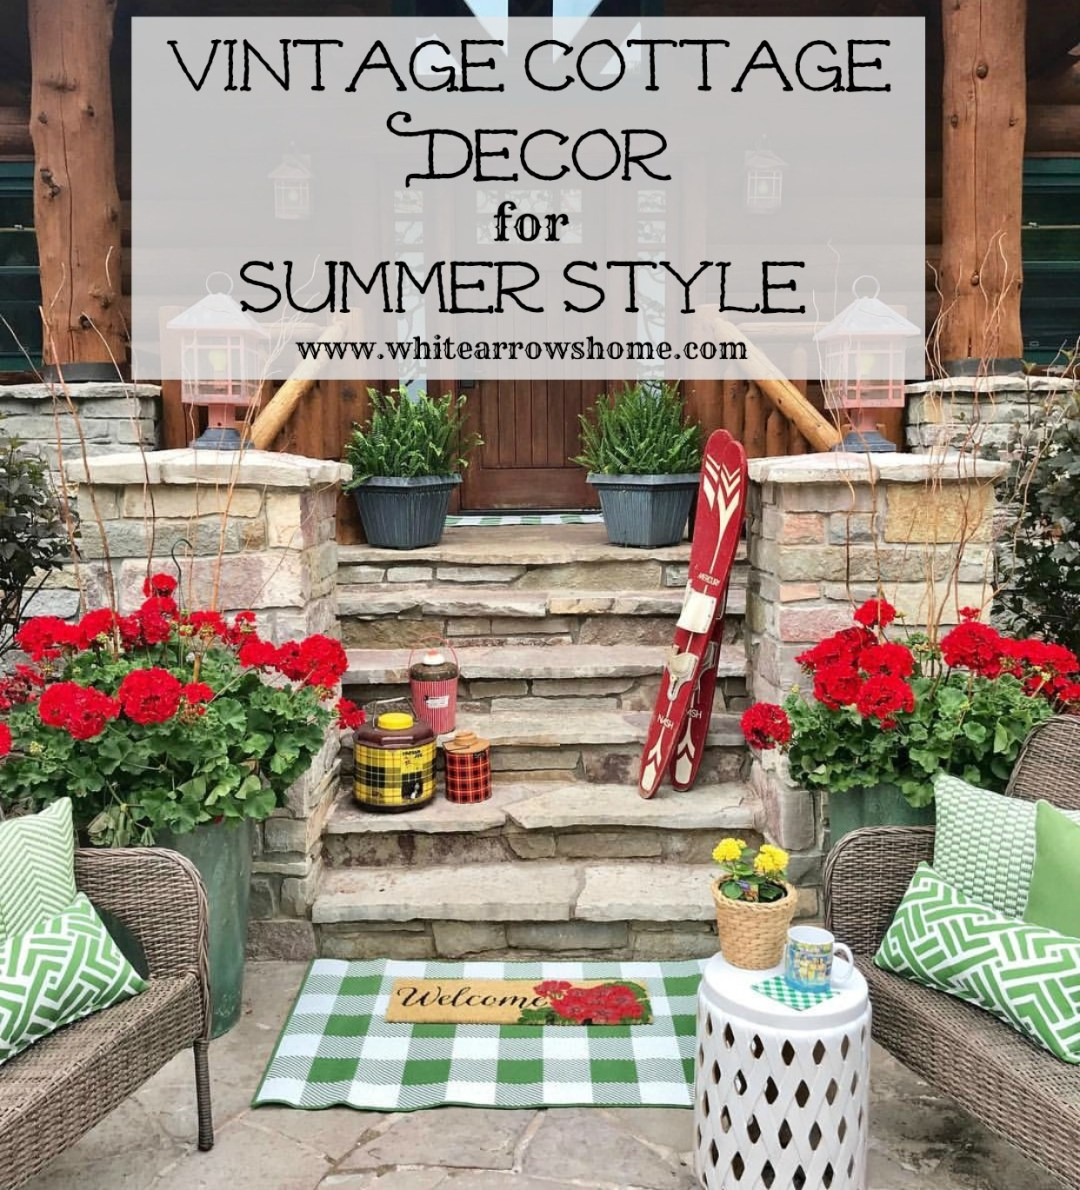 Vintage Cottage Decor Summer Style